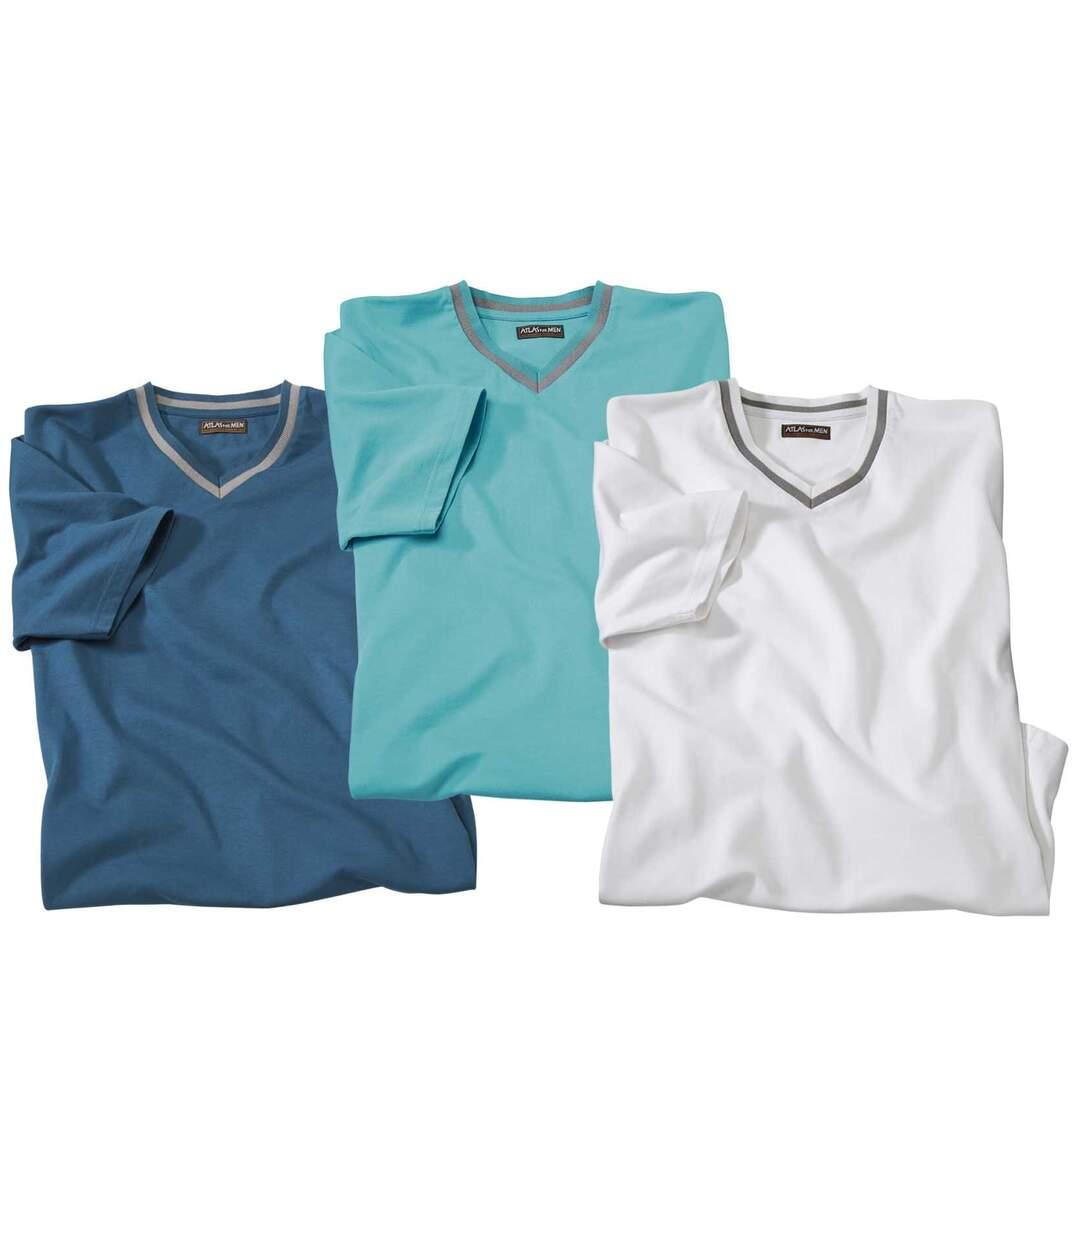 Sada 3 triček Summer Classic